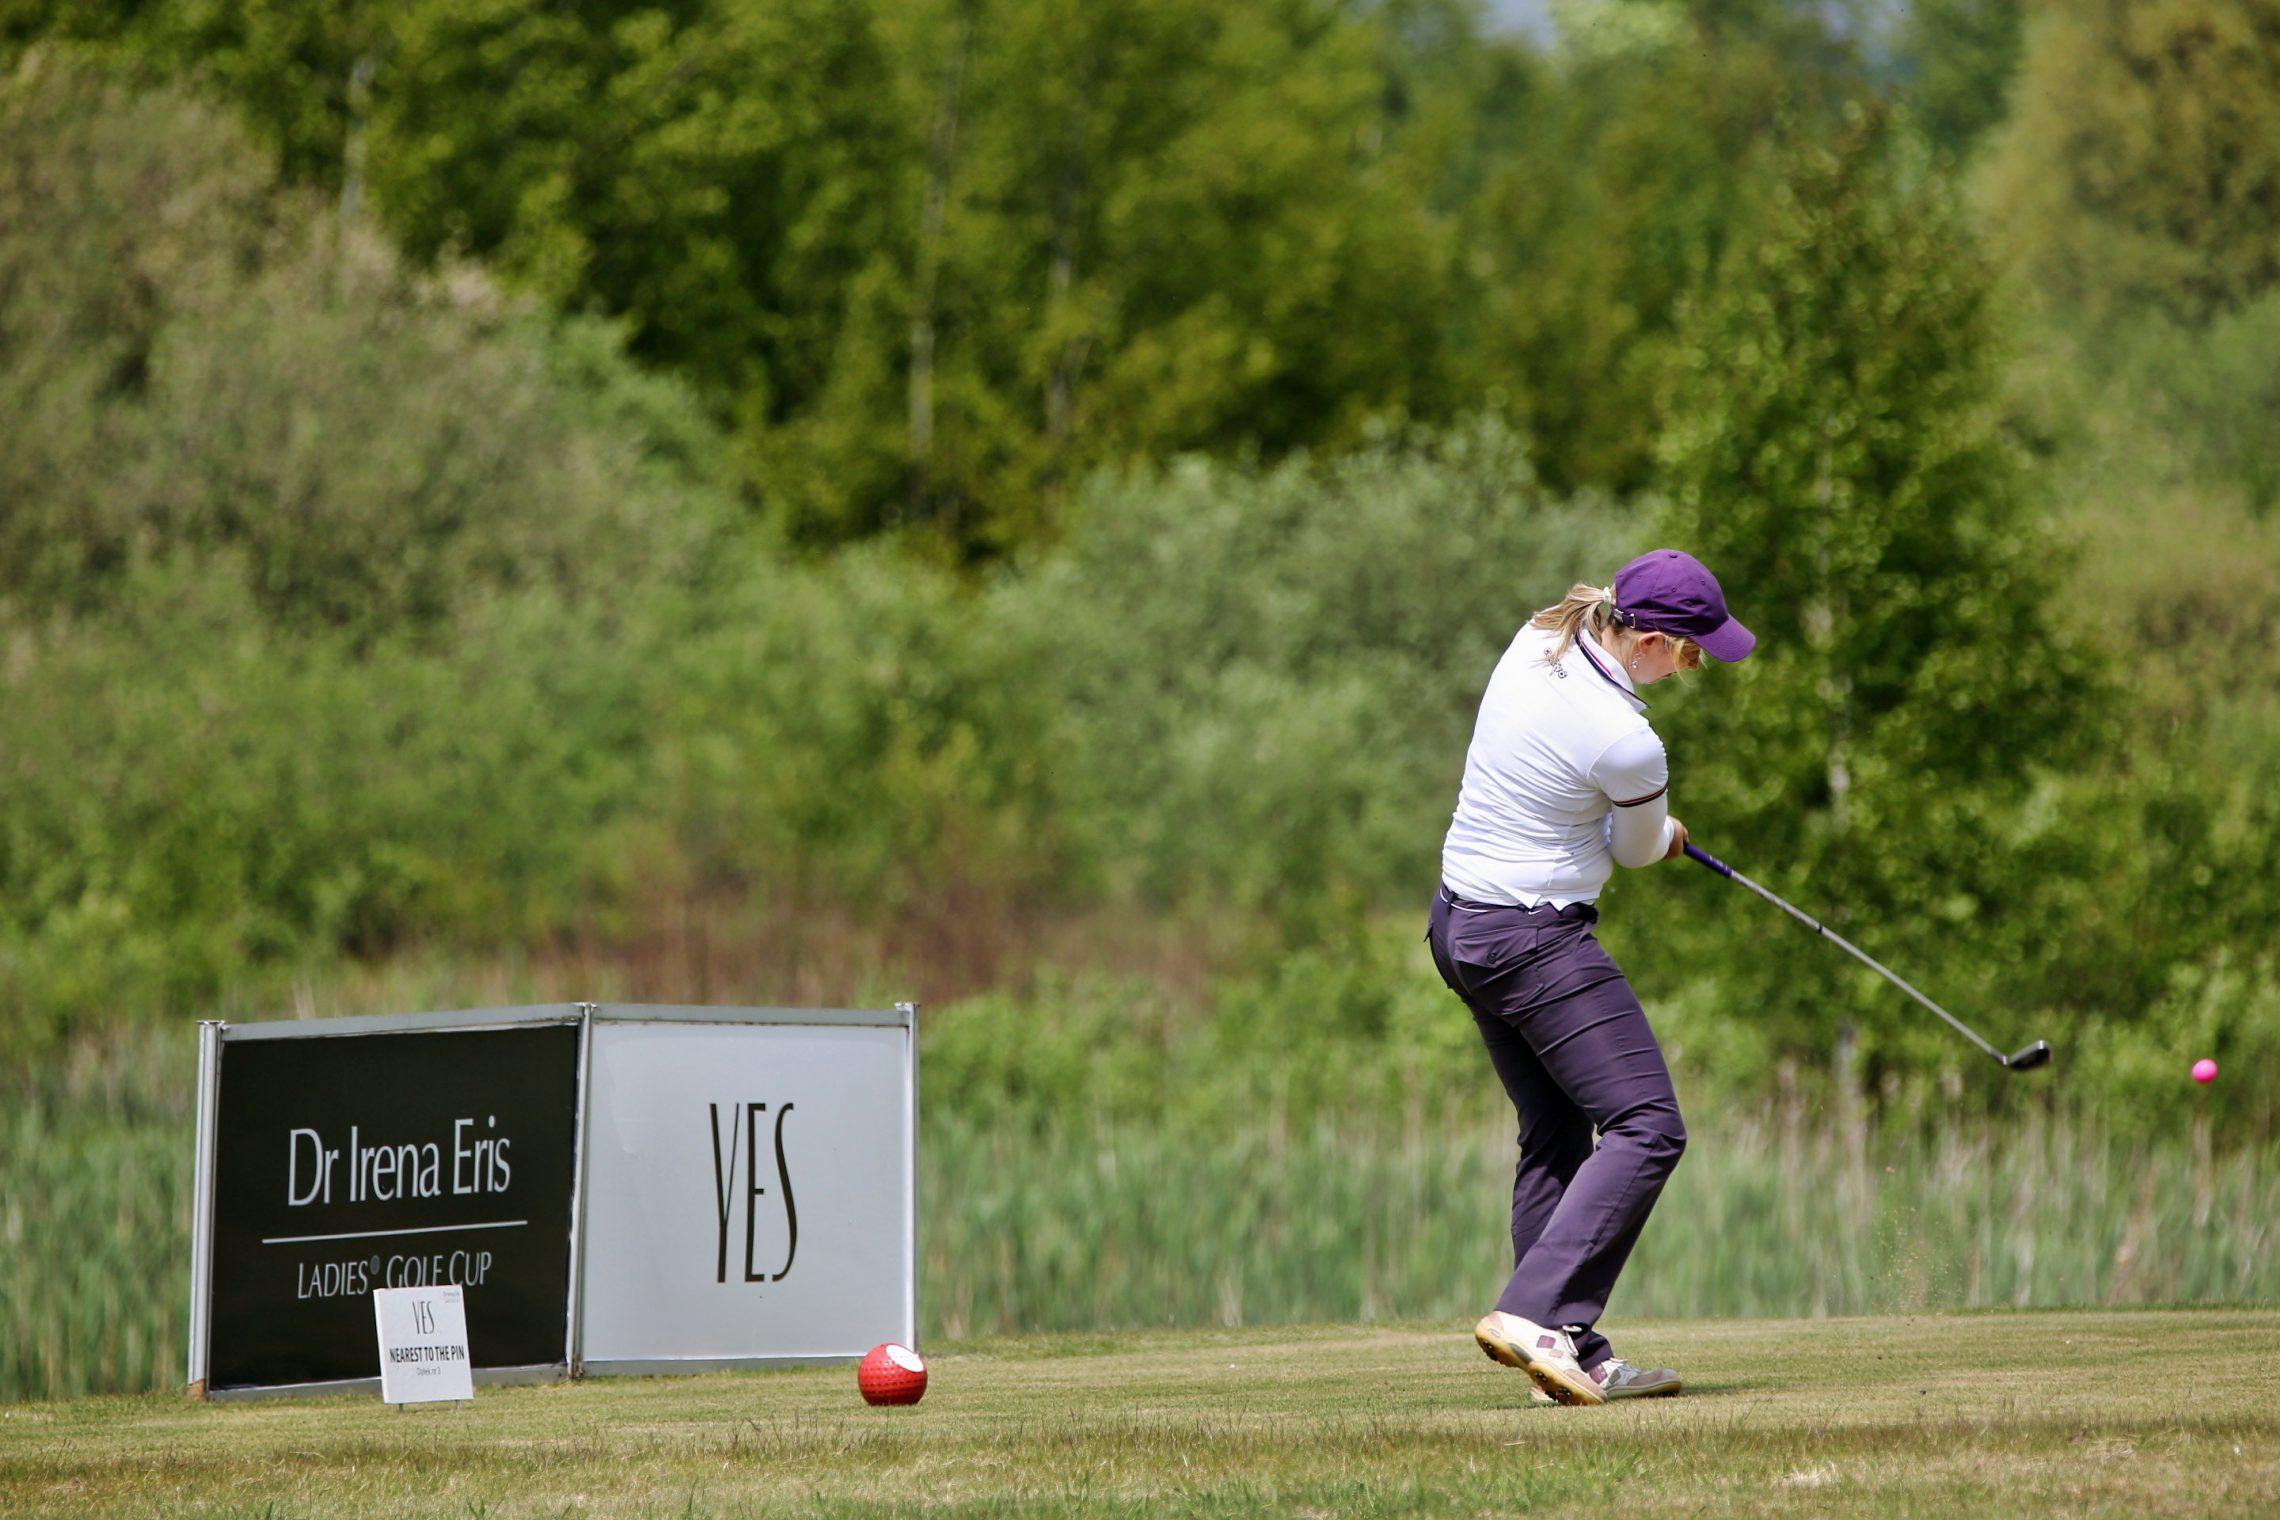 YES na Dr Irena Eris Ladies' Golf Cup